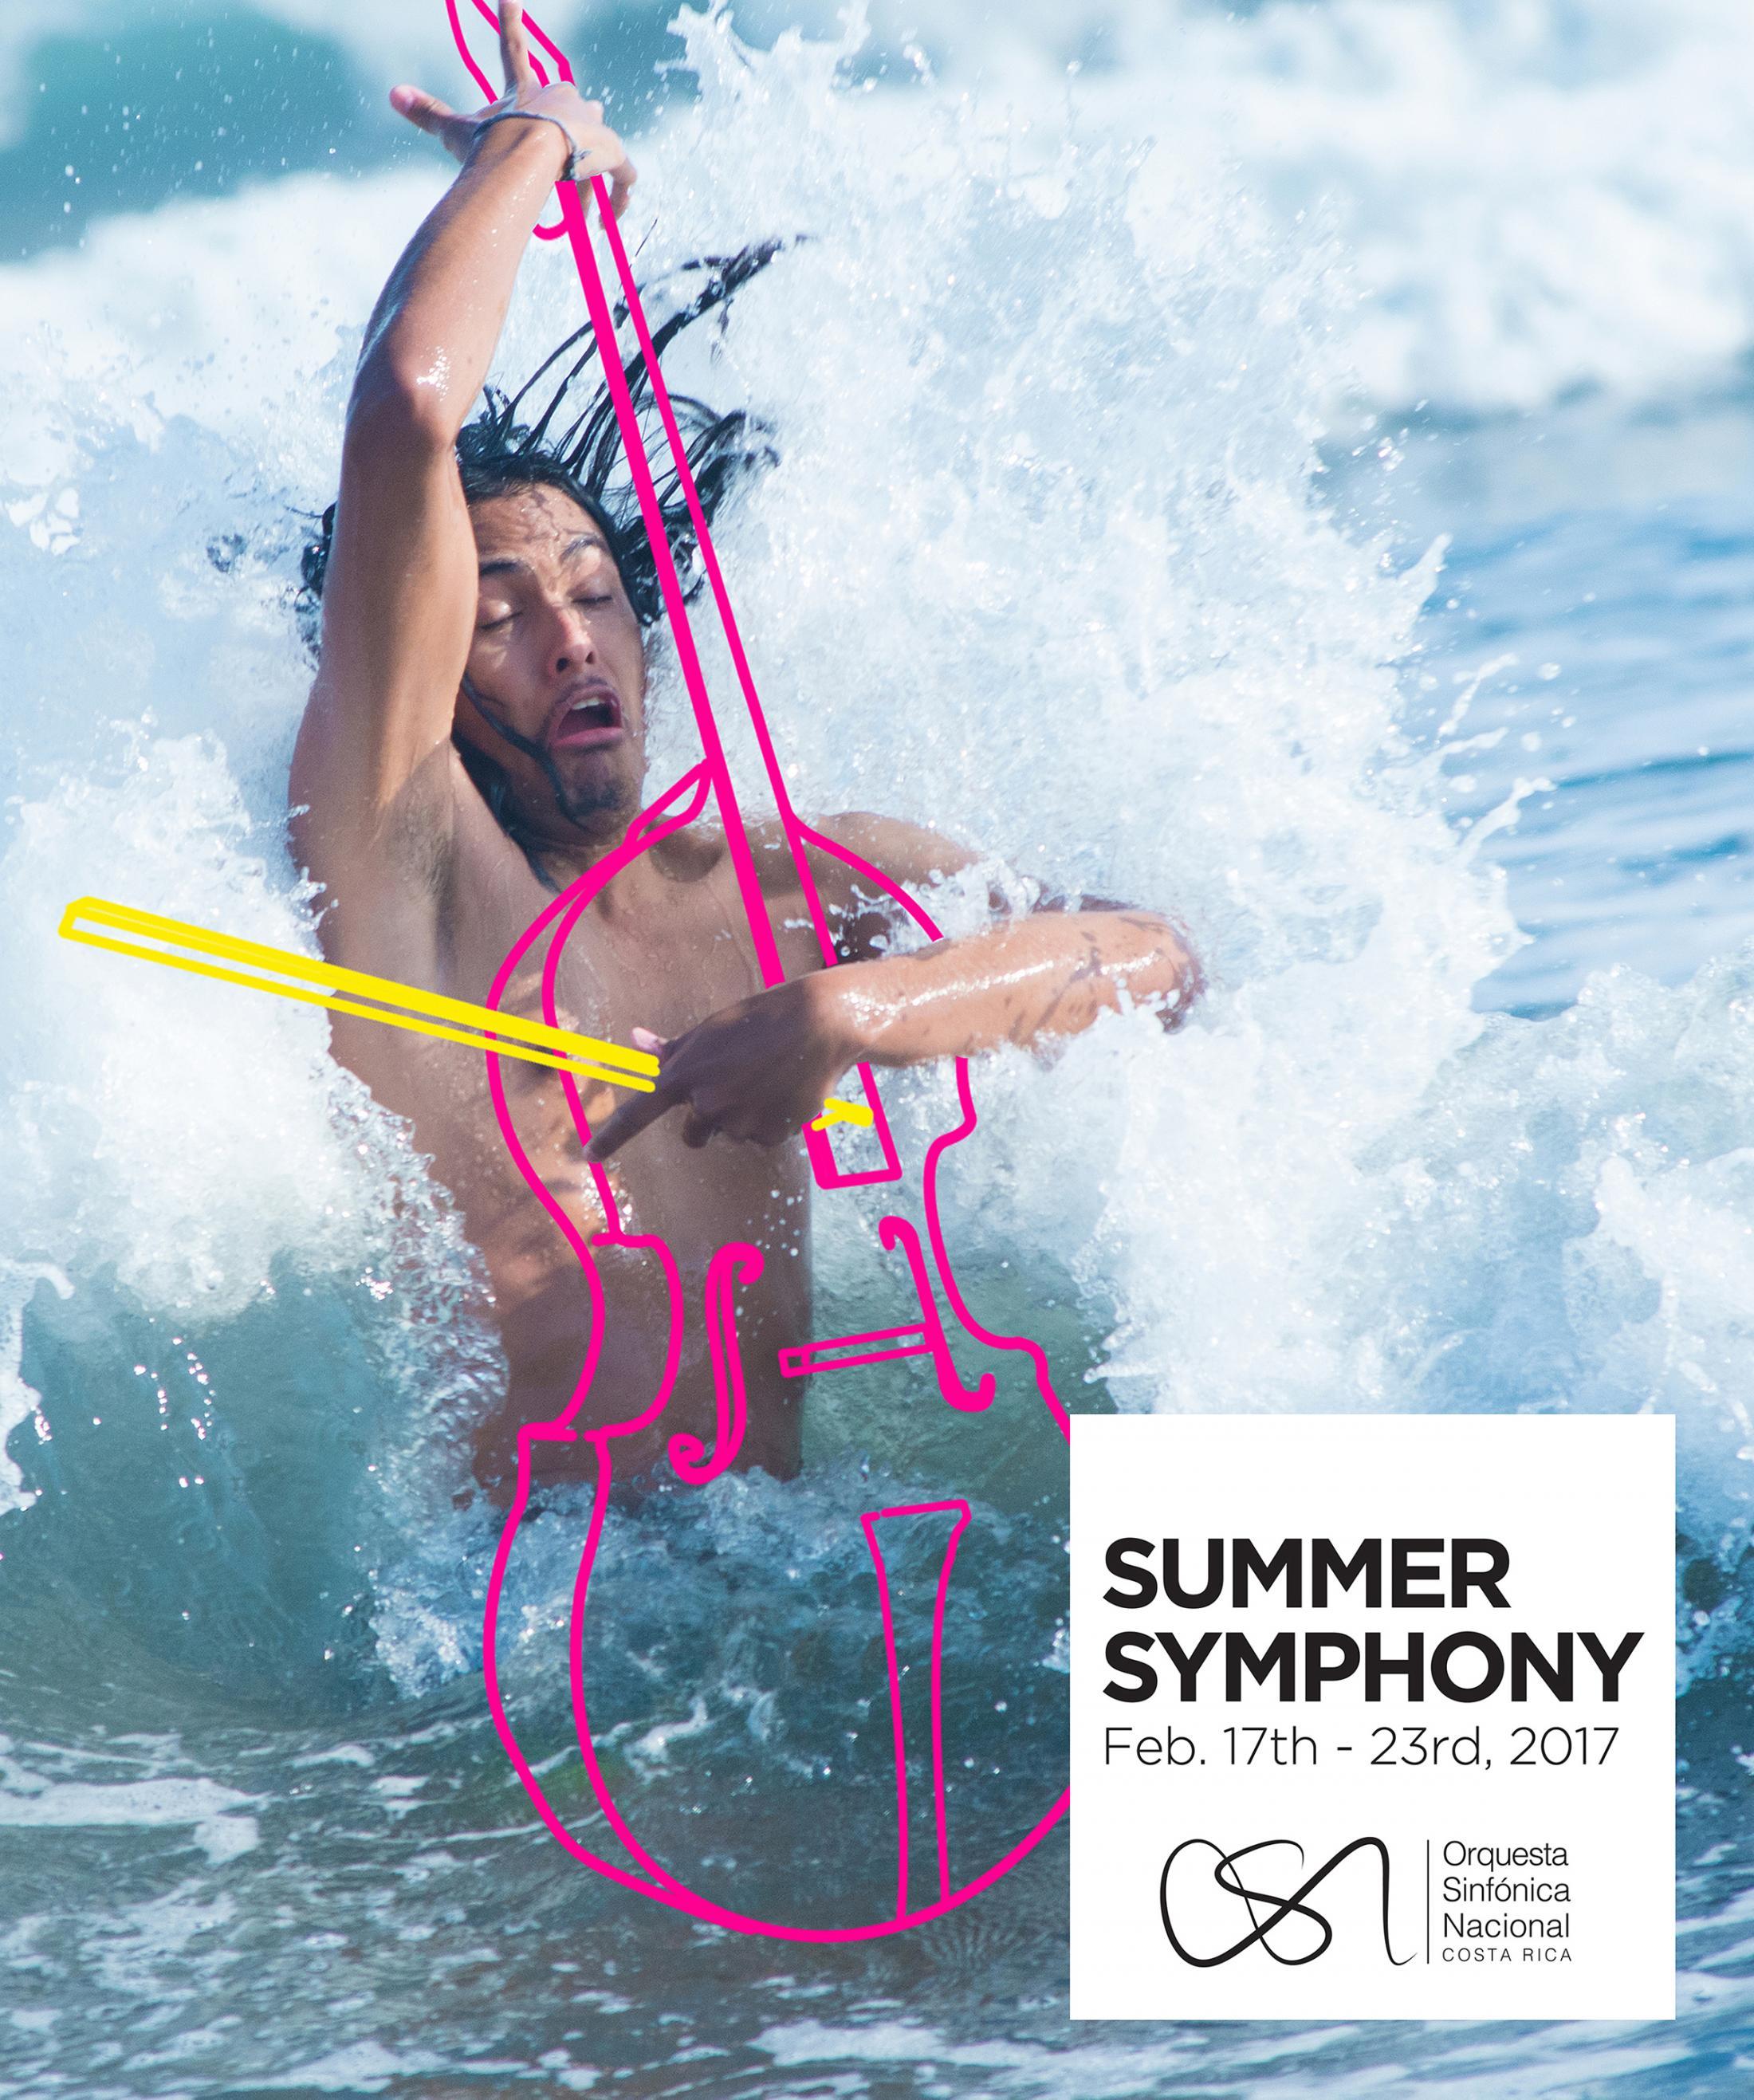 Orquesta Sinfónica Nacional Outdoor Ad - Summer Symphony - Violoncello